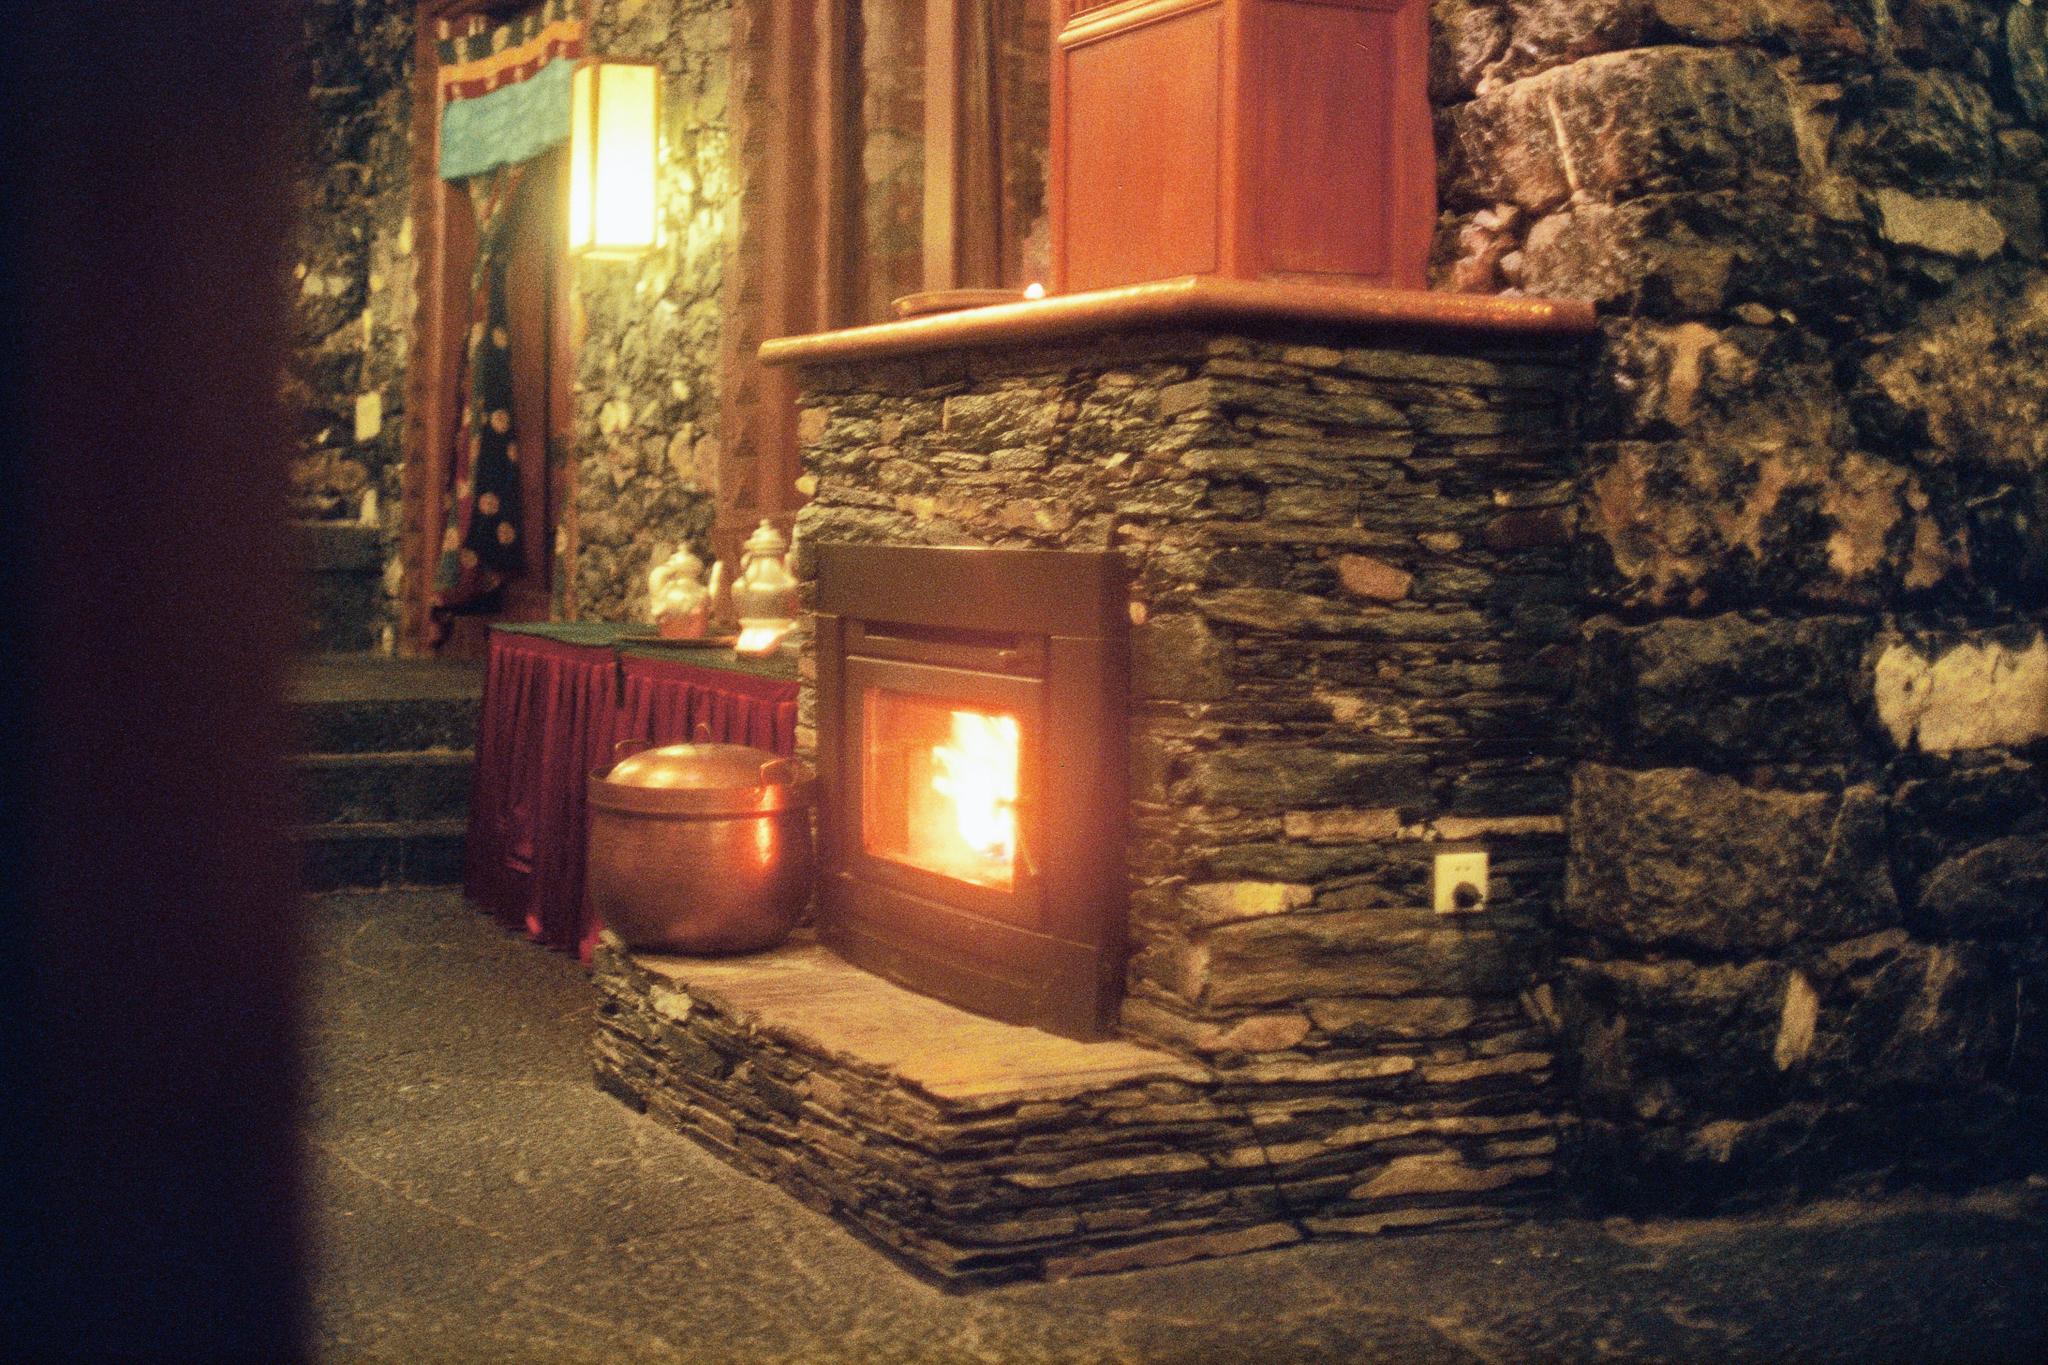 Dinner by the fire in Shangri-La!